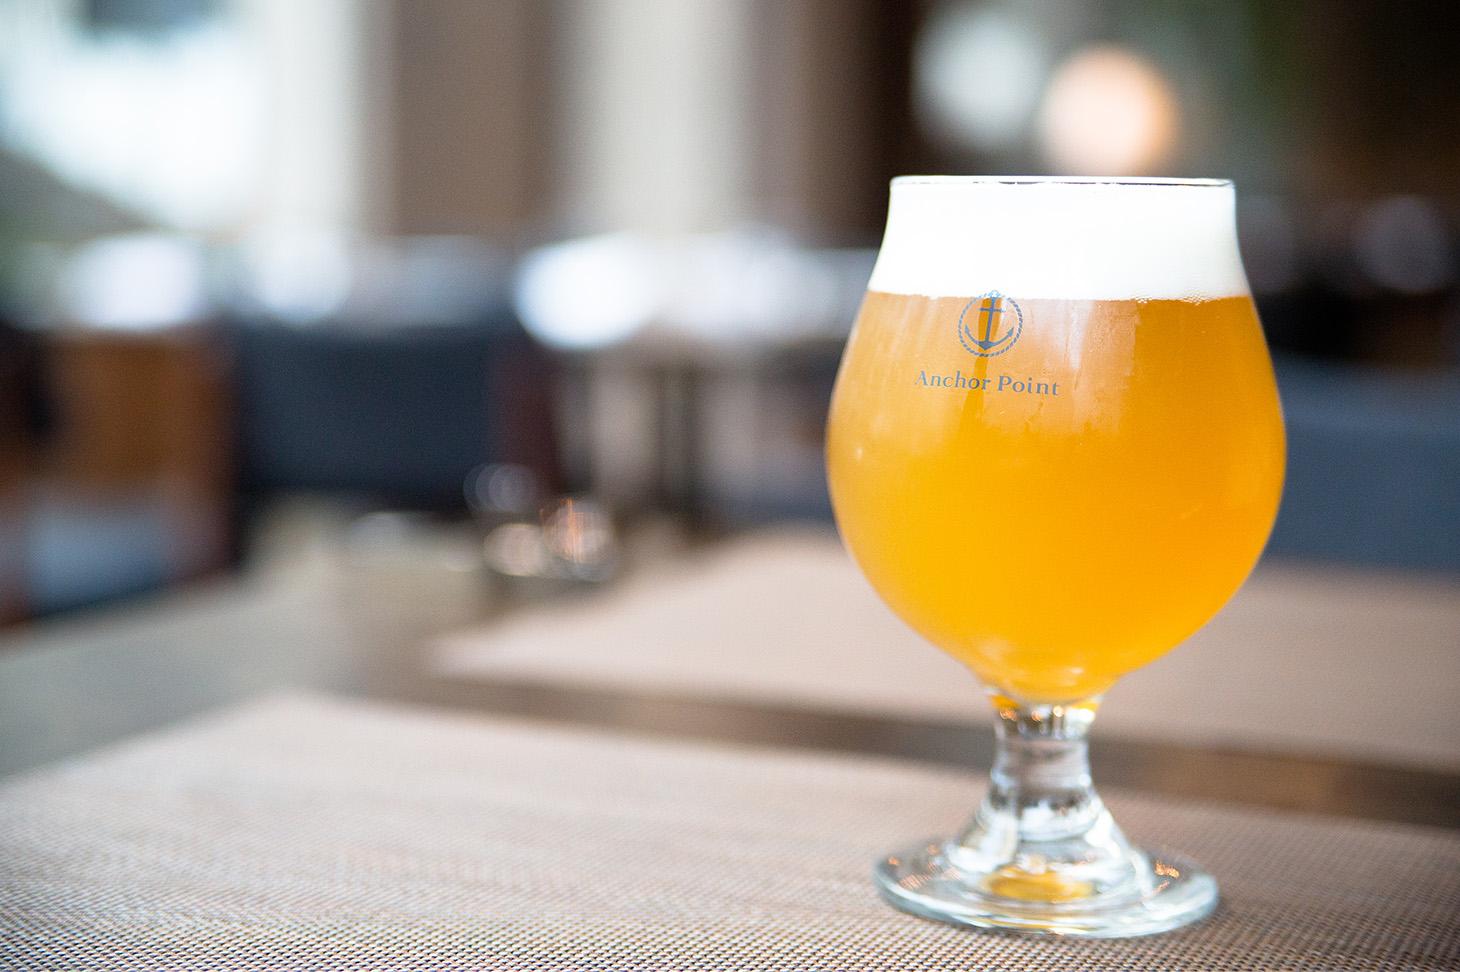 Anchor Point - クラフトビール